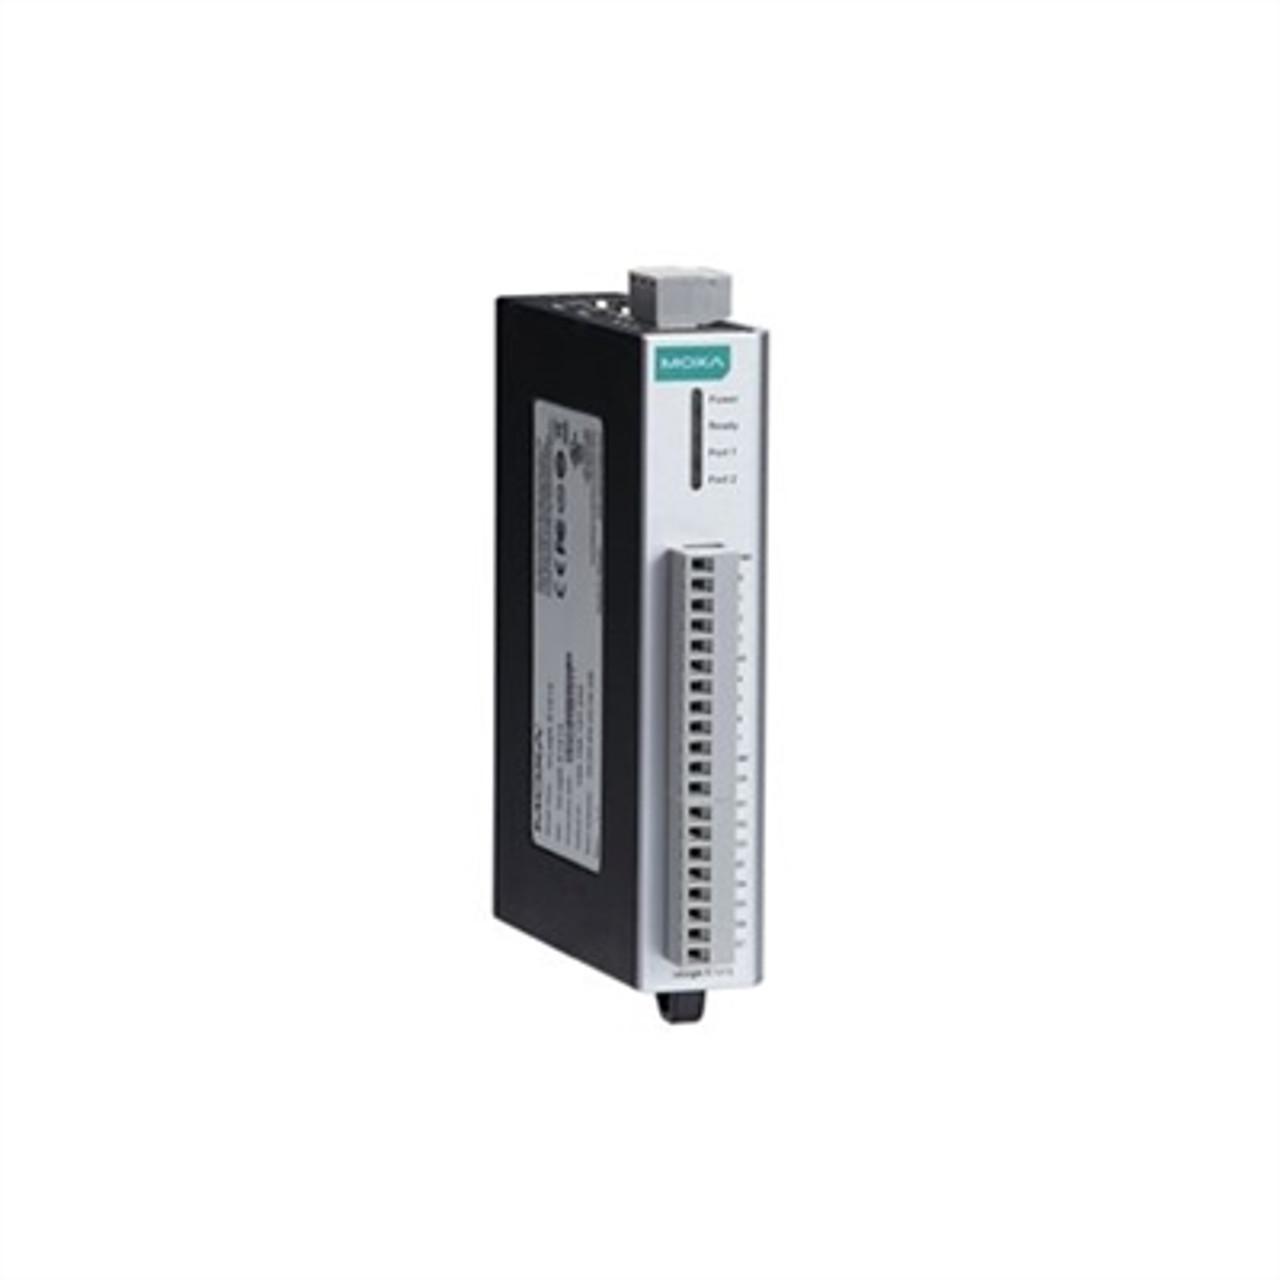 Moxa ioLogik E1242 Remote Ethernet I/O